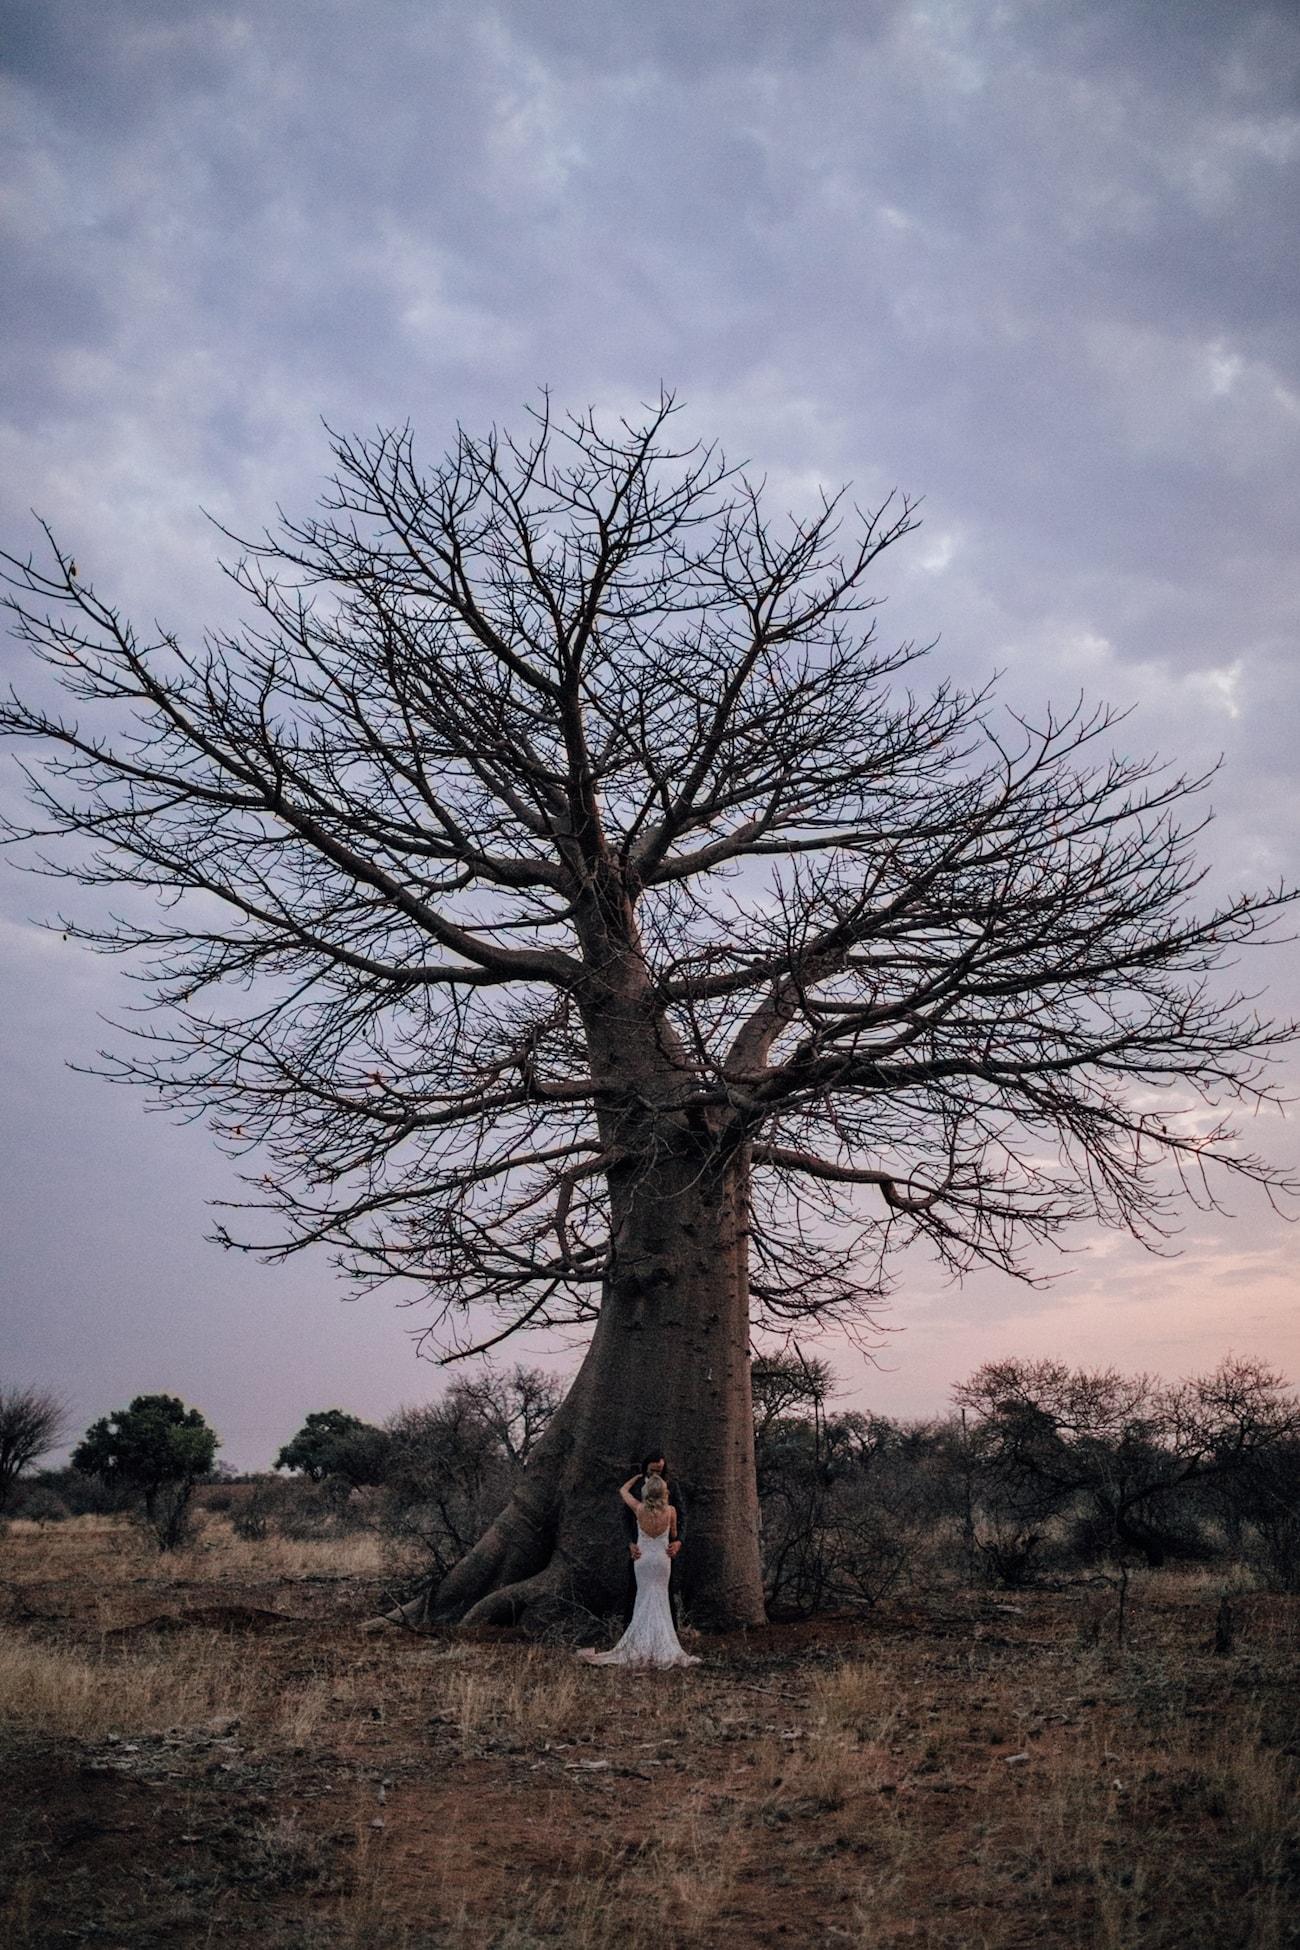 South Africa Bush Wedding | Credit: Page & Holmes